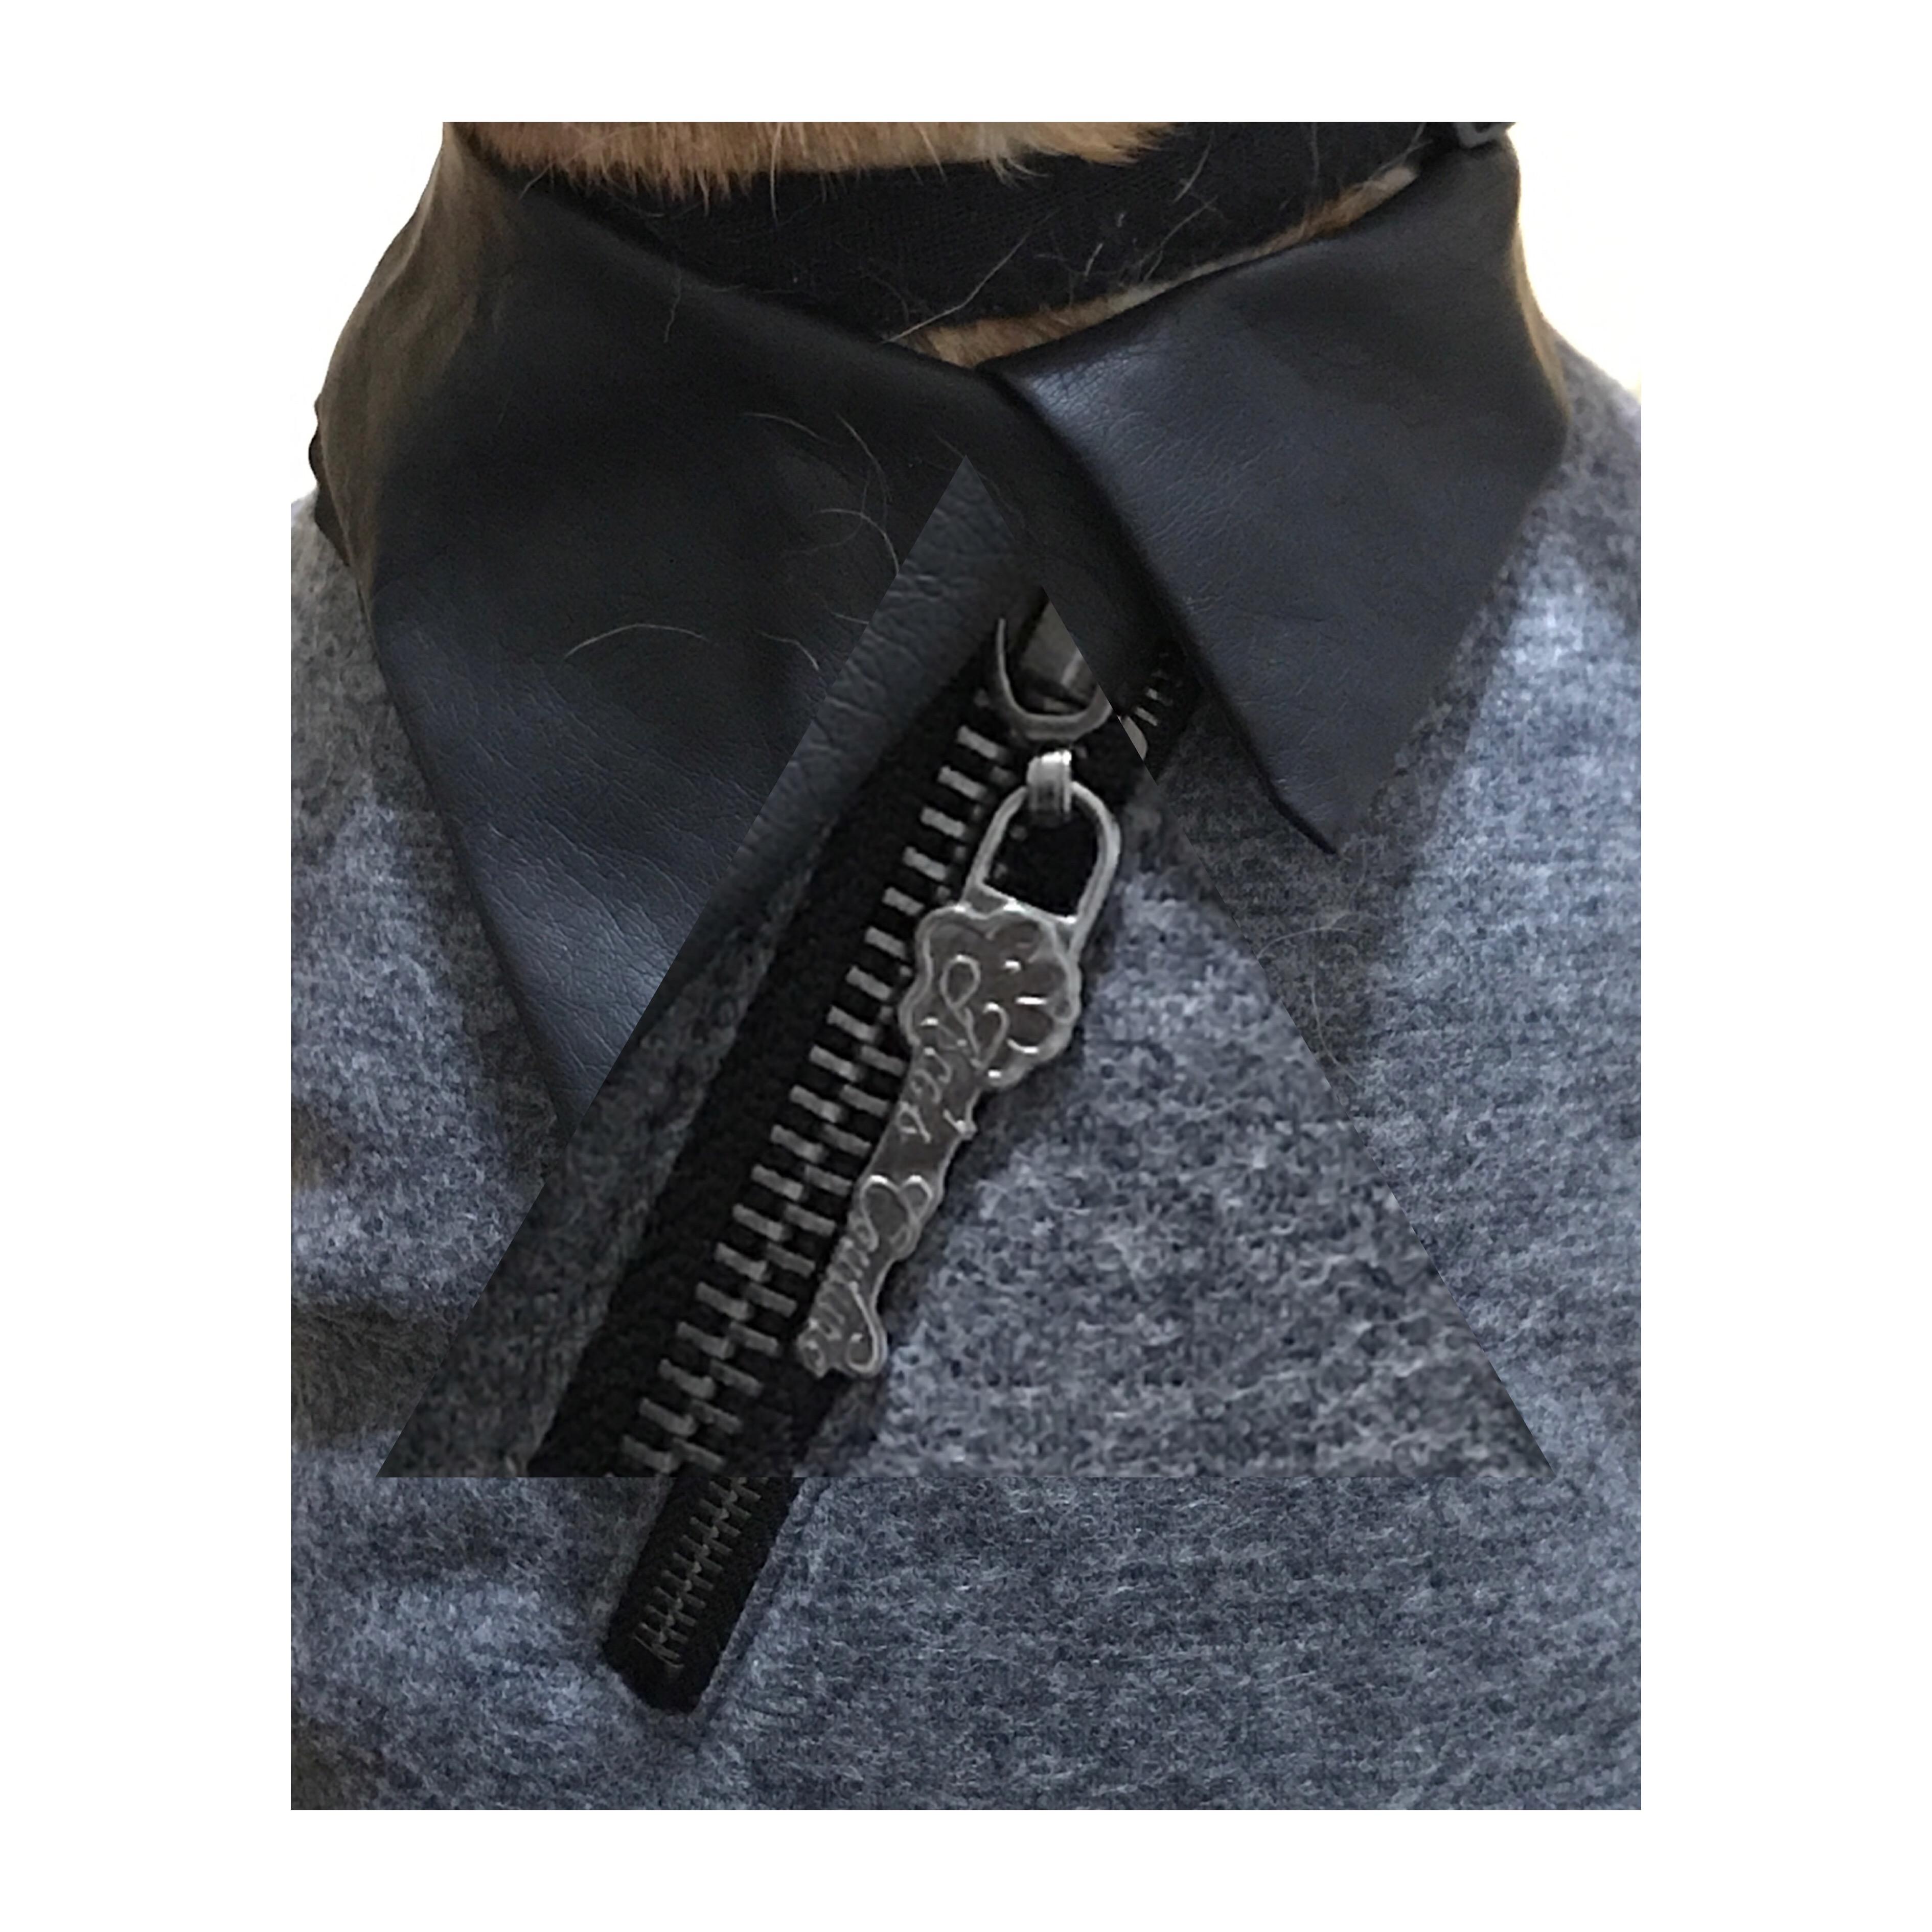 Collar Jacket Gunmetal Zipper